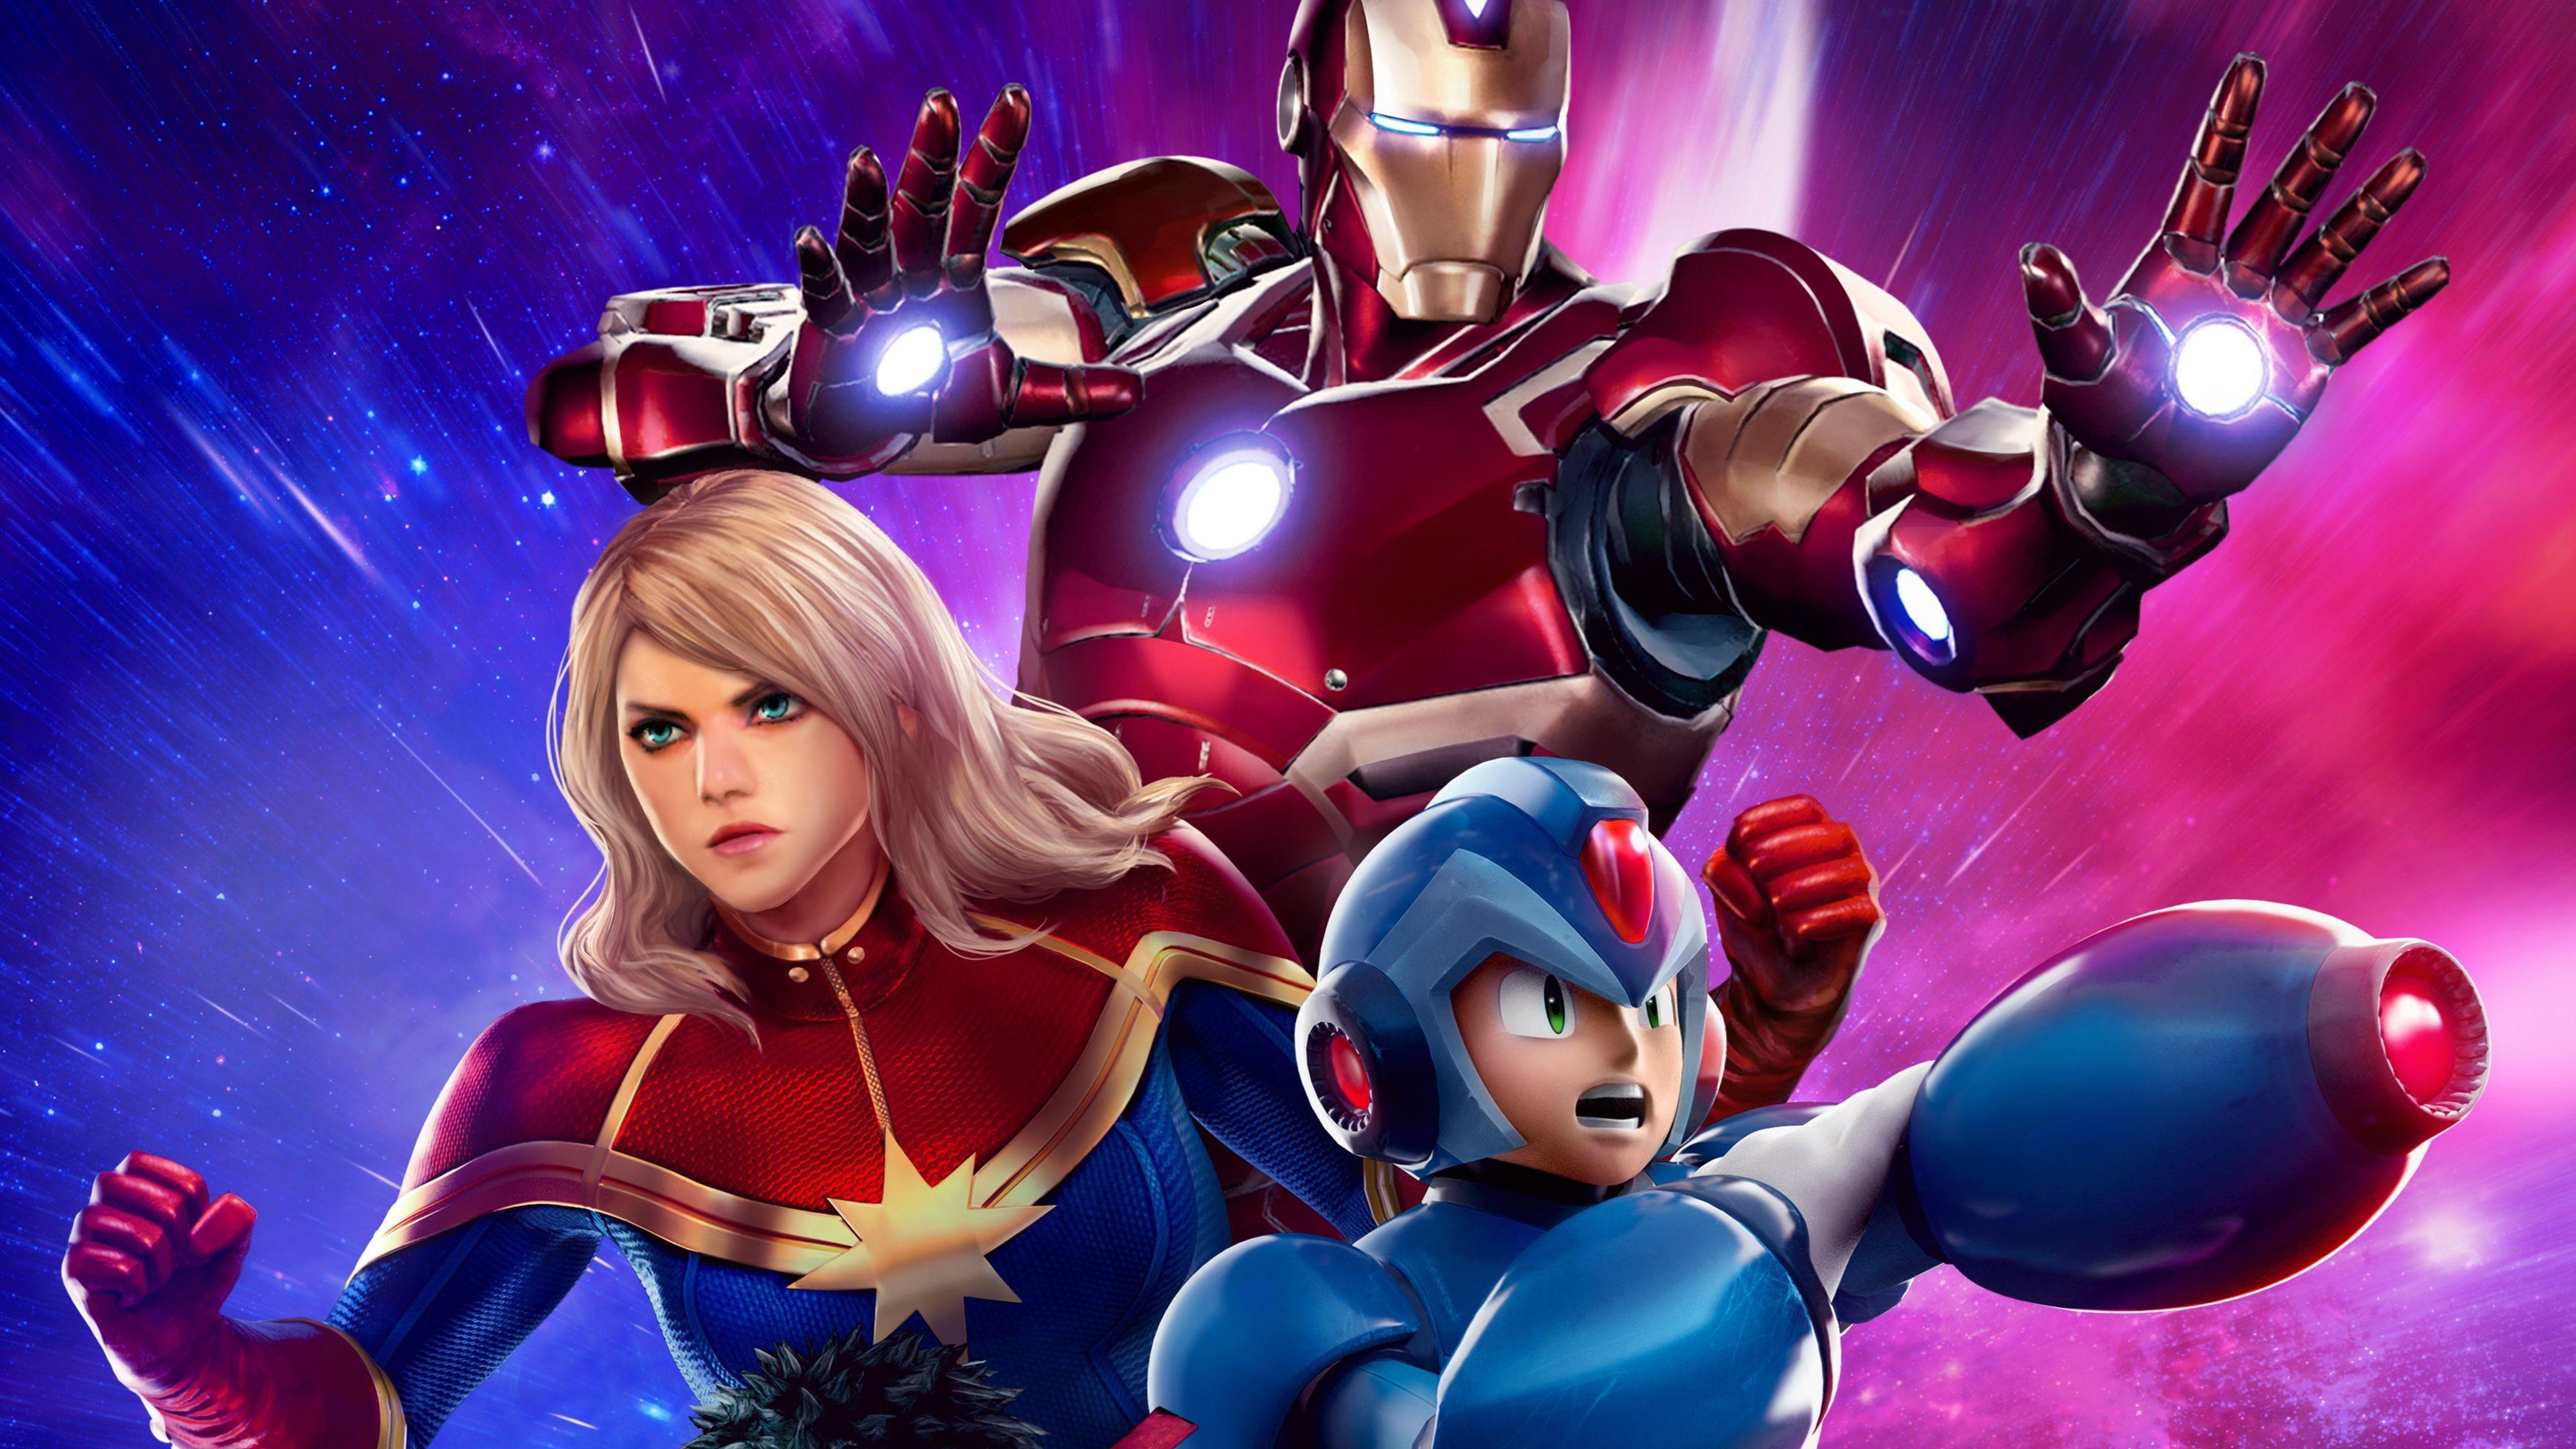 Hình ảnh Captain Marvel đẹp